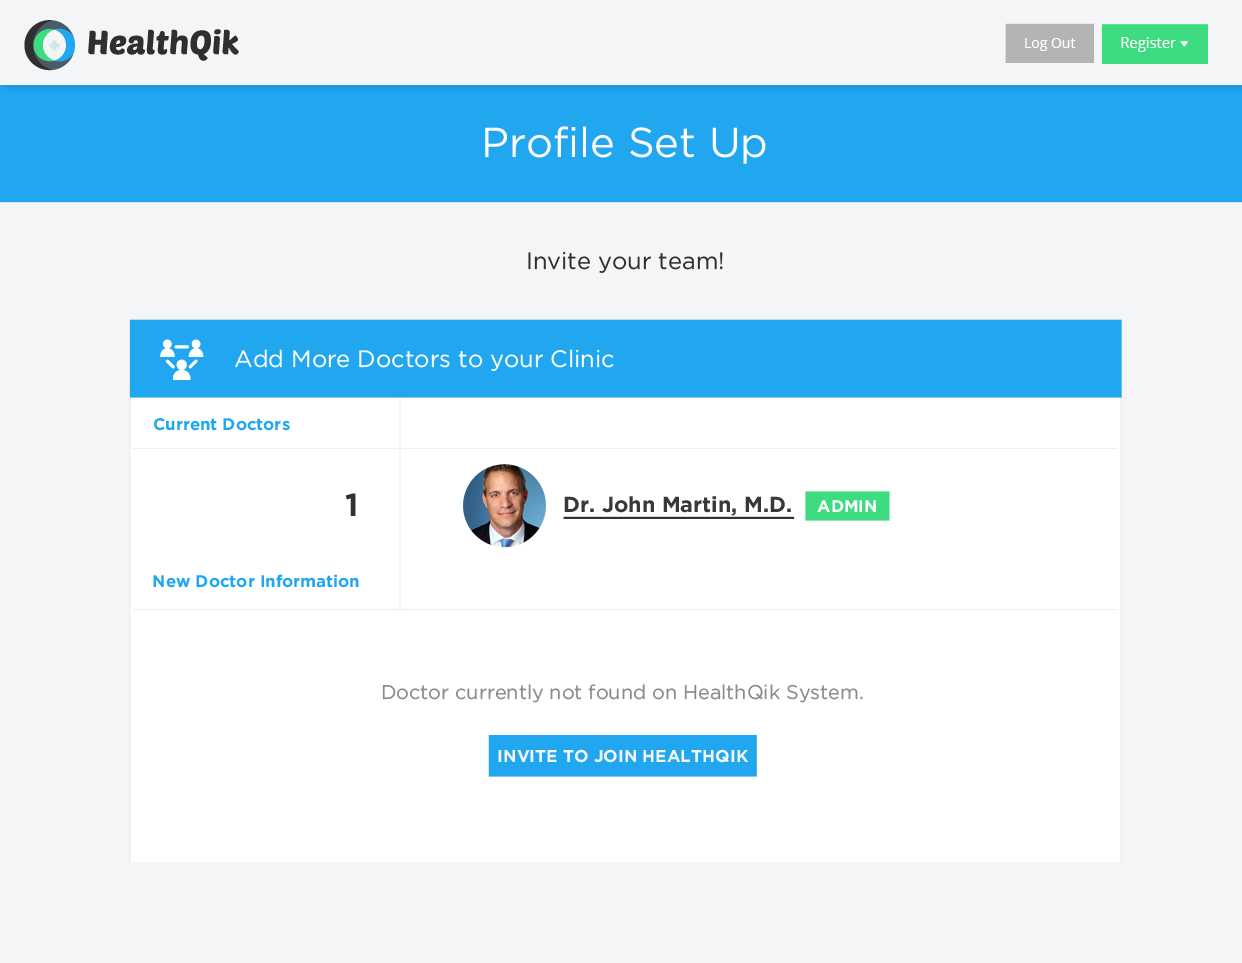 HealthQikHomepage_ProfileSetup_AddDocPart3V3.png